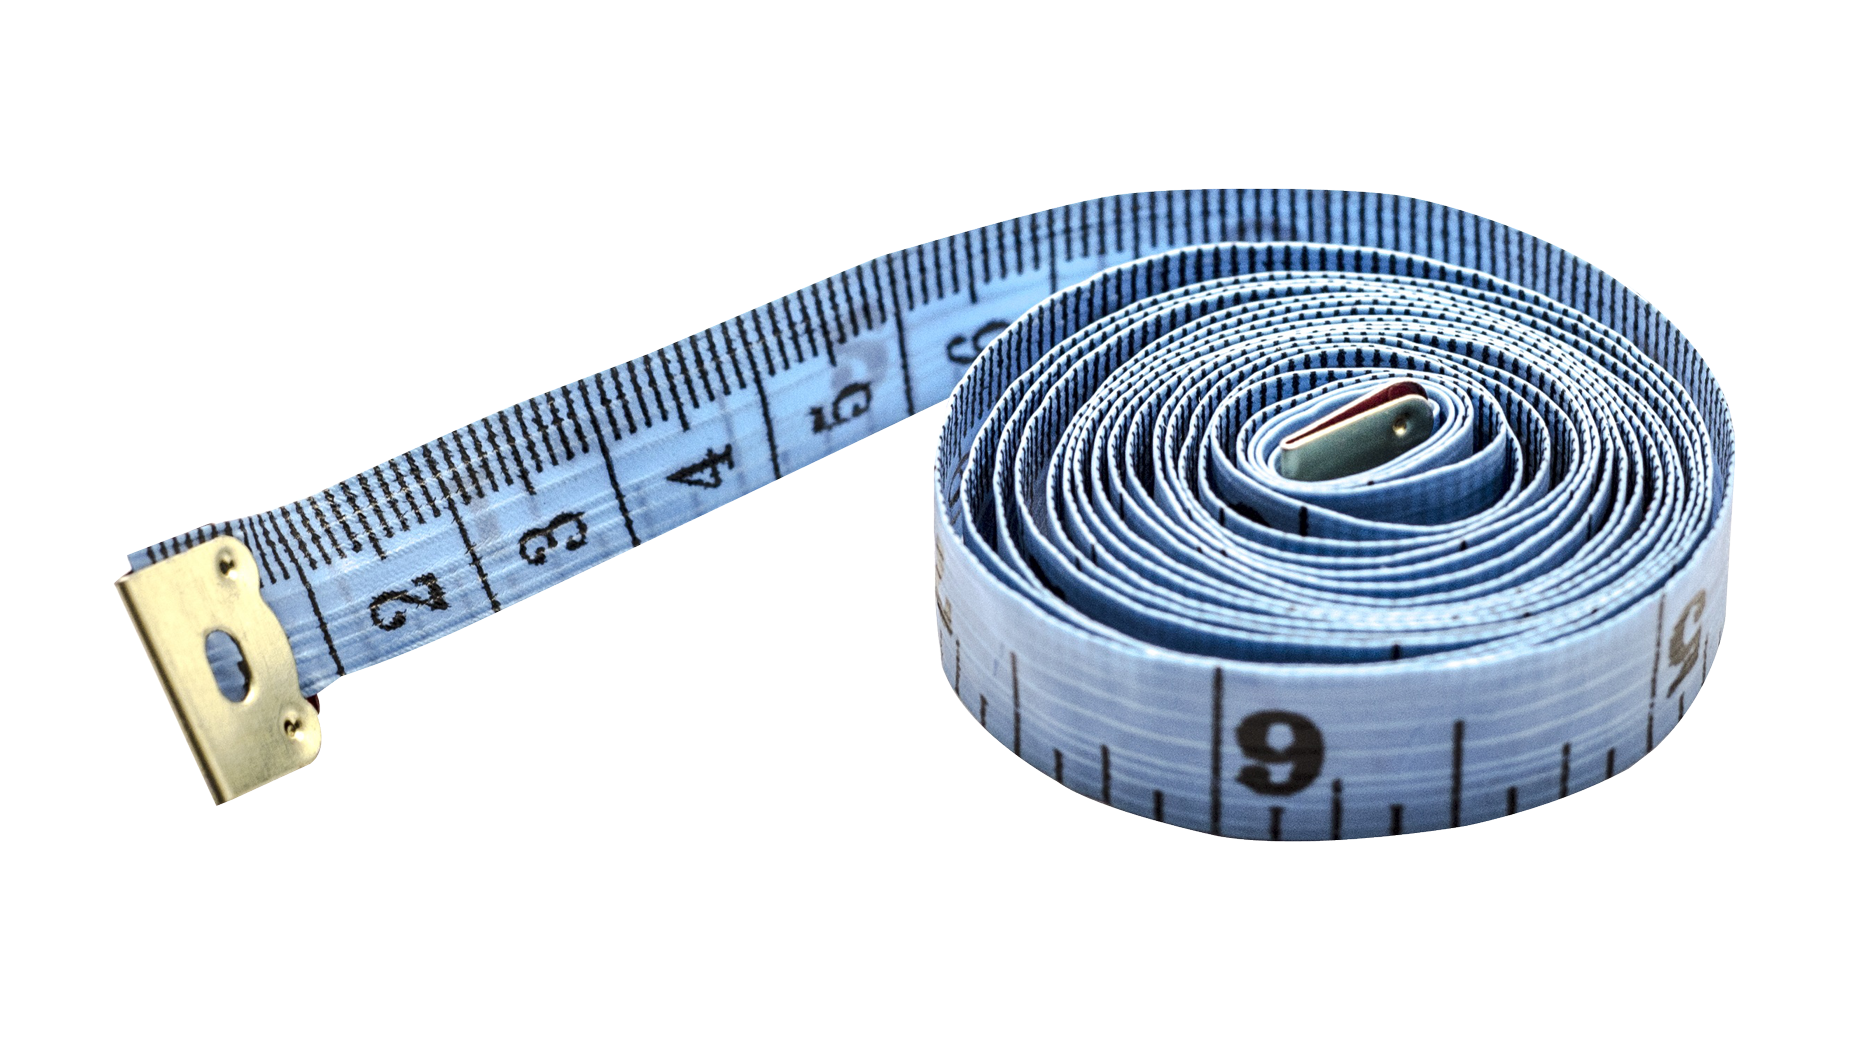 Measure Tape Png Image Tape Measurements Png